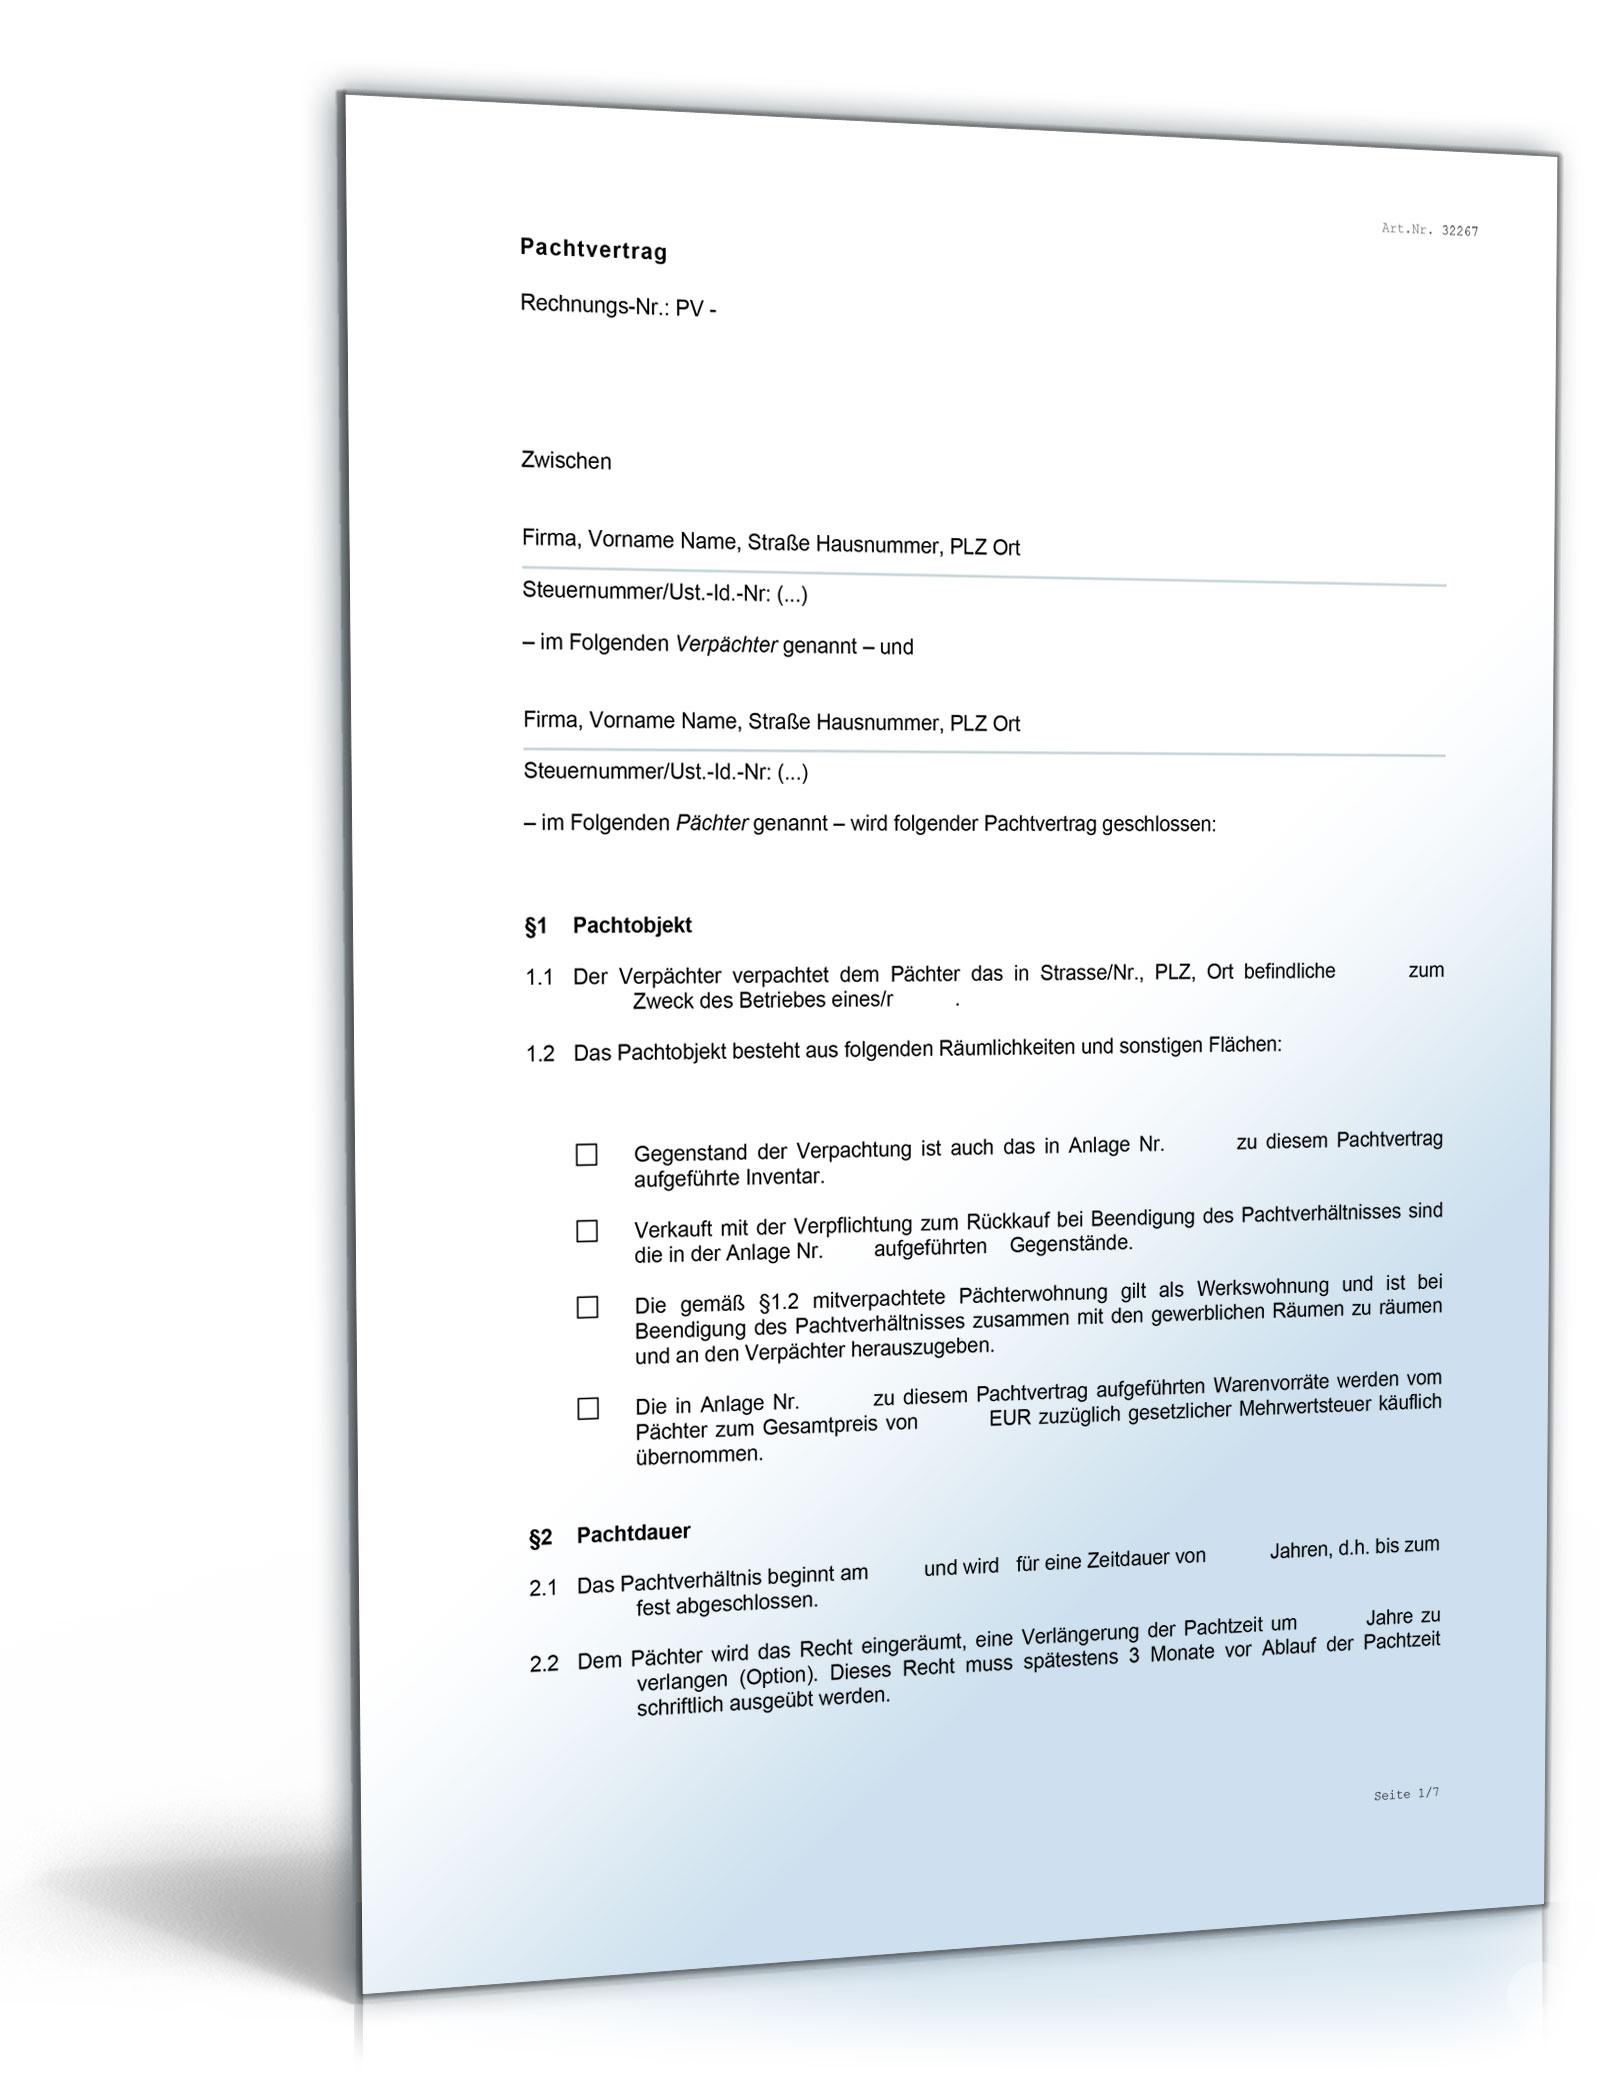 gaststtten pachtvertrag word dokument download amazonde software - Kundigung Pachtvertrag Muster